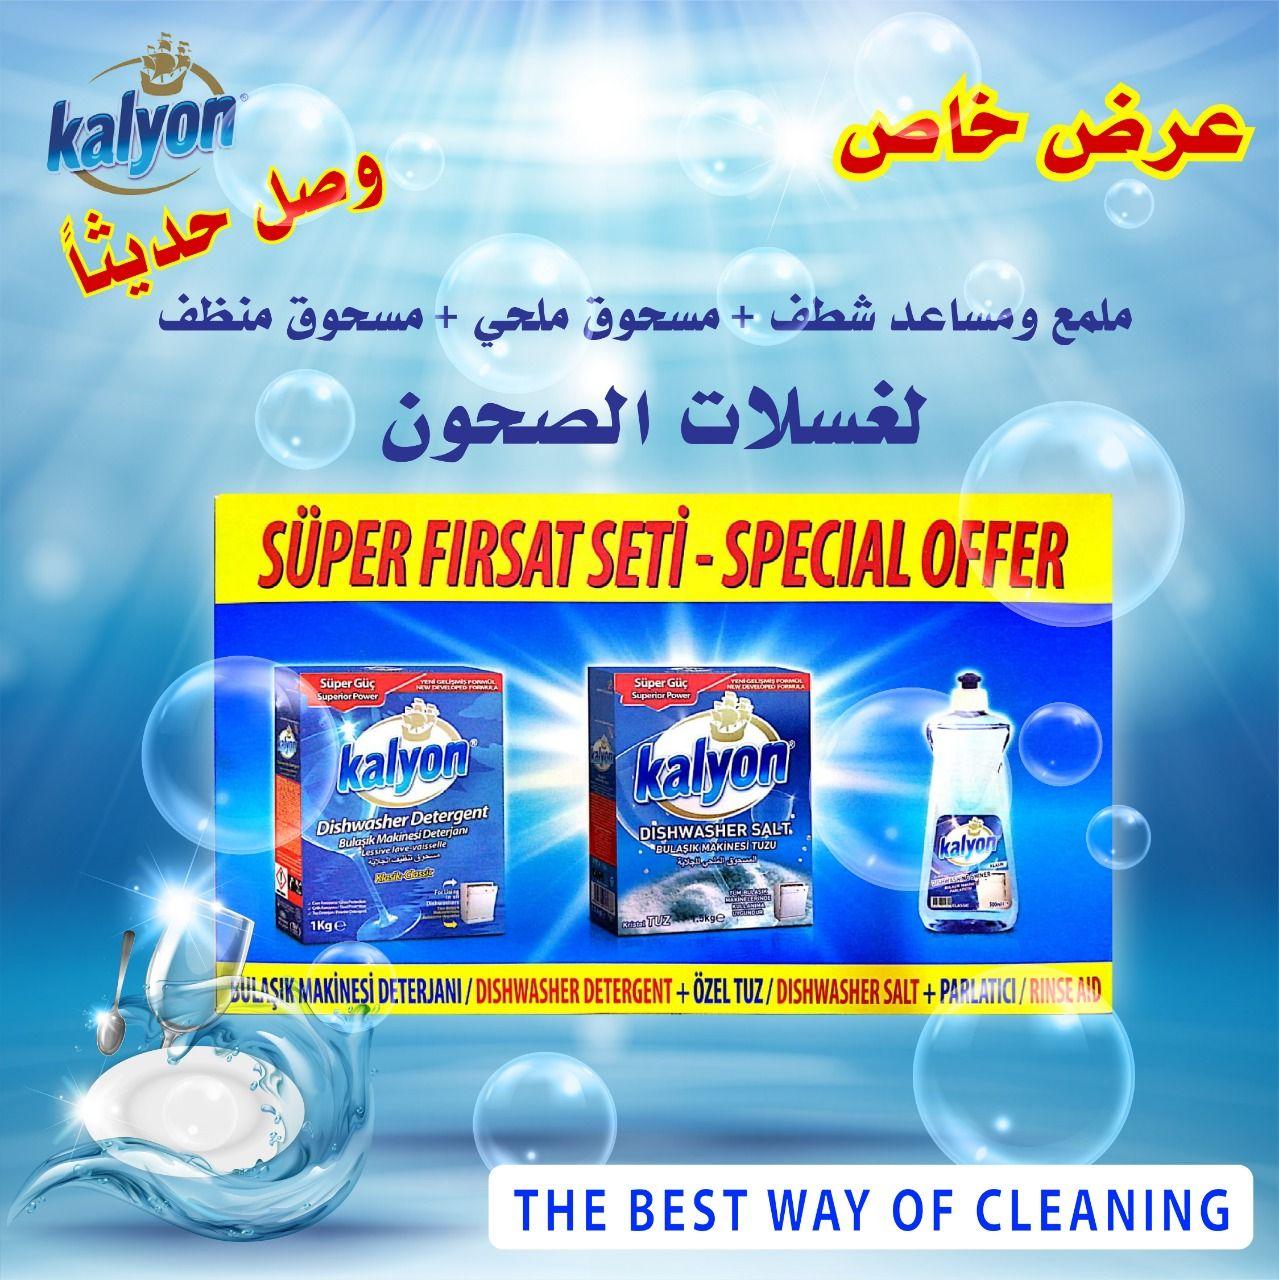 ملمع لغسالات الصحون ادوات نظافه تنظيف نظافة تمه Dishwasher Detergent Rinse Aid Detergent